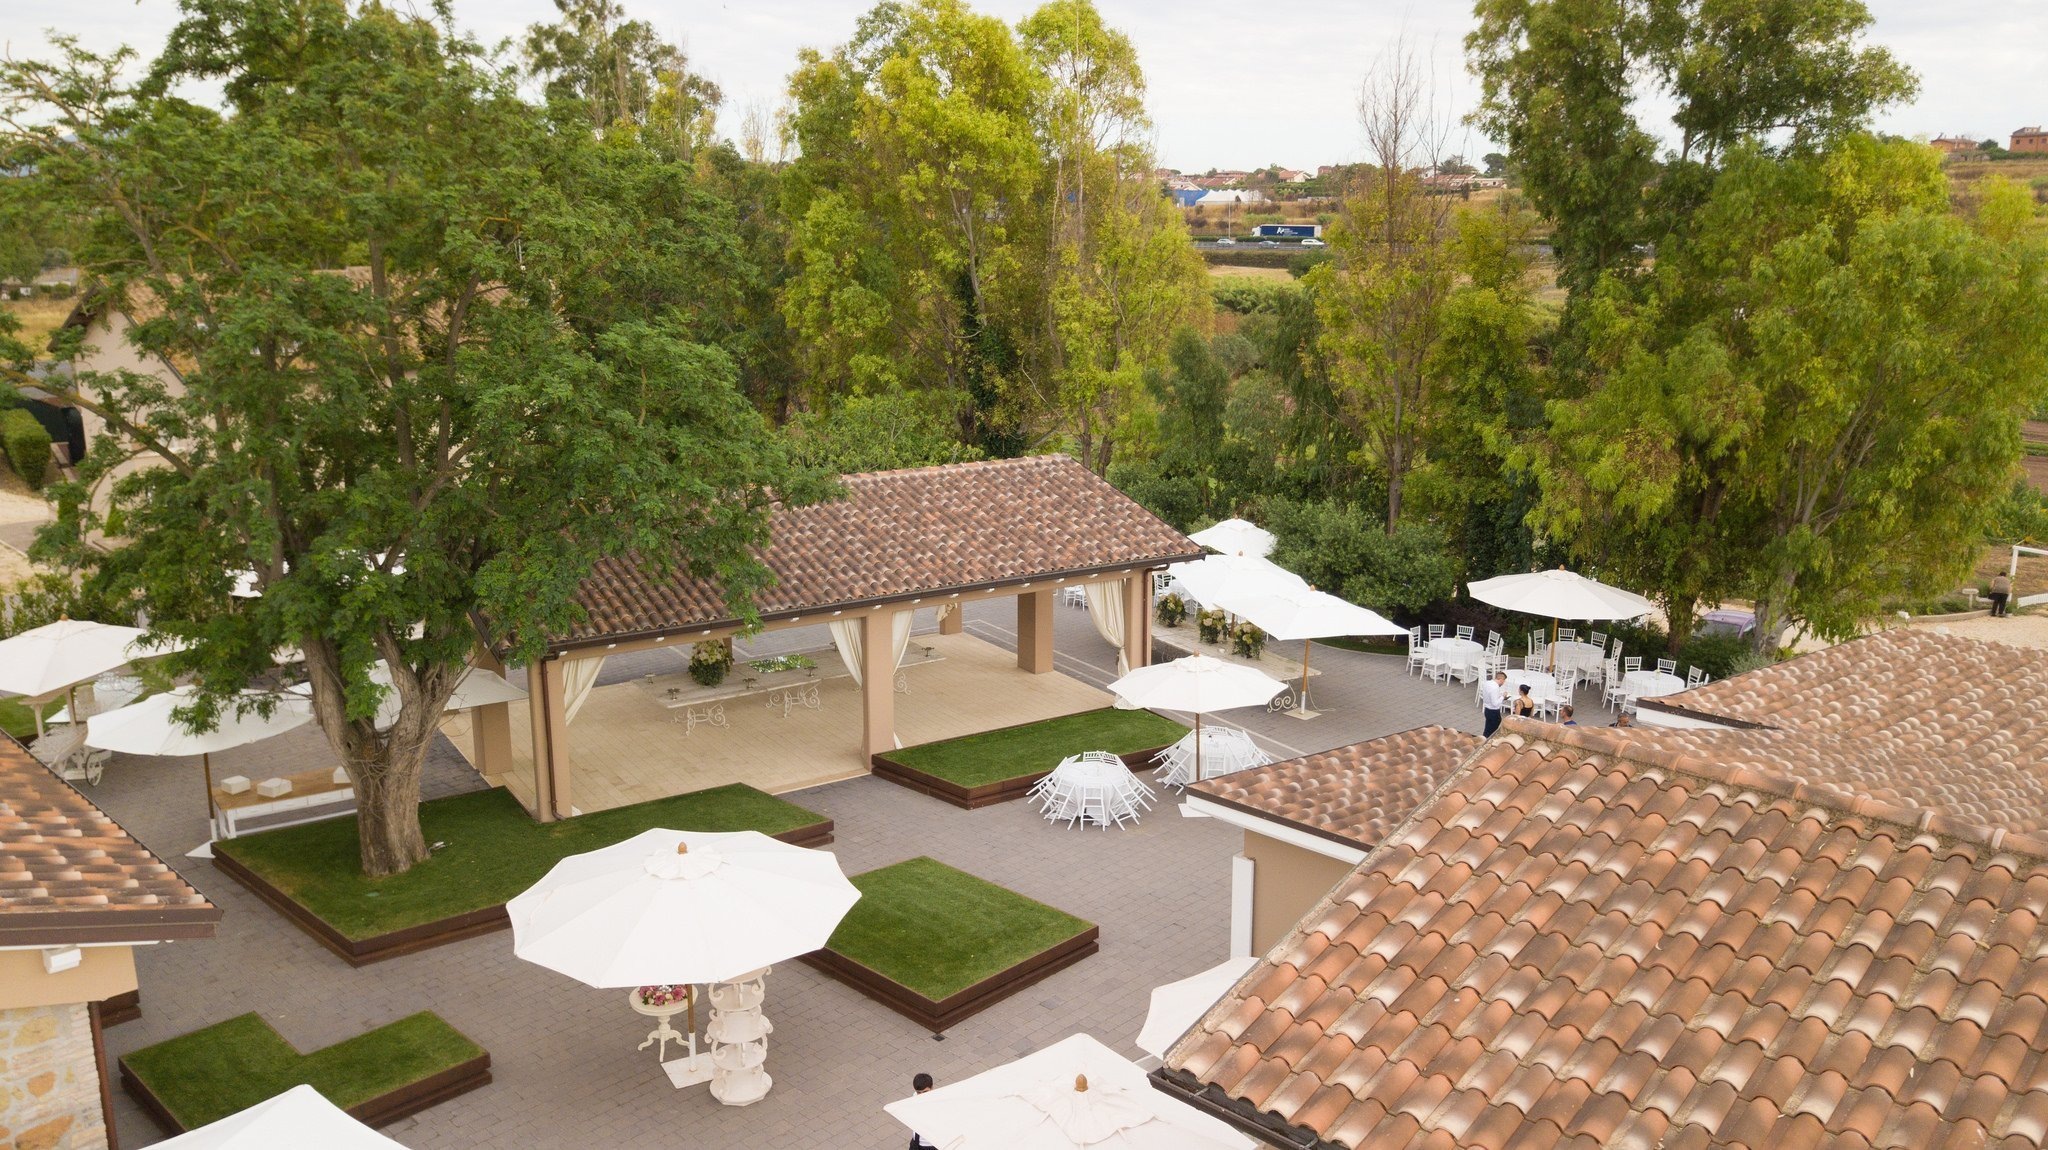 Matrimonio in Villa le Jarden Potager: Esterno